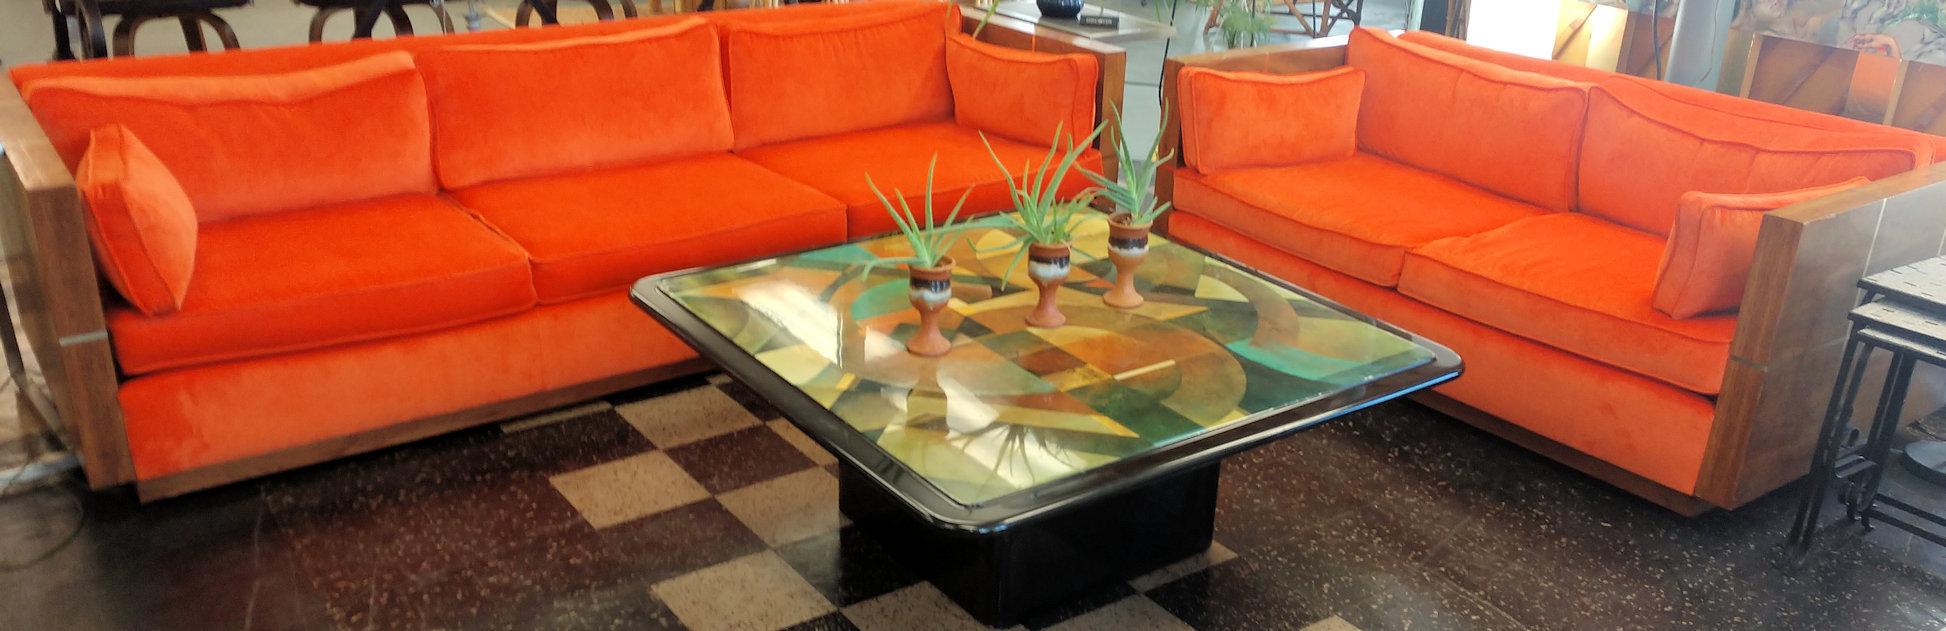 LR0269-Op-Art-Coffee-Table4